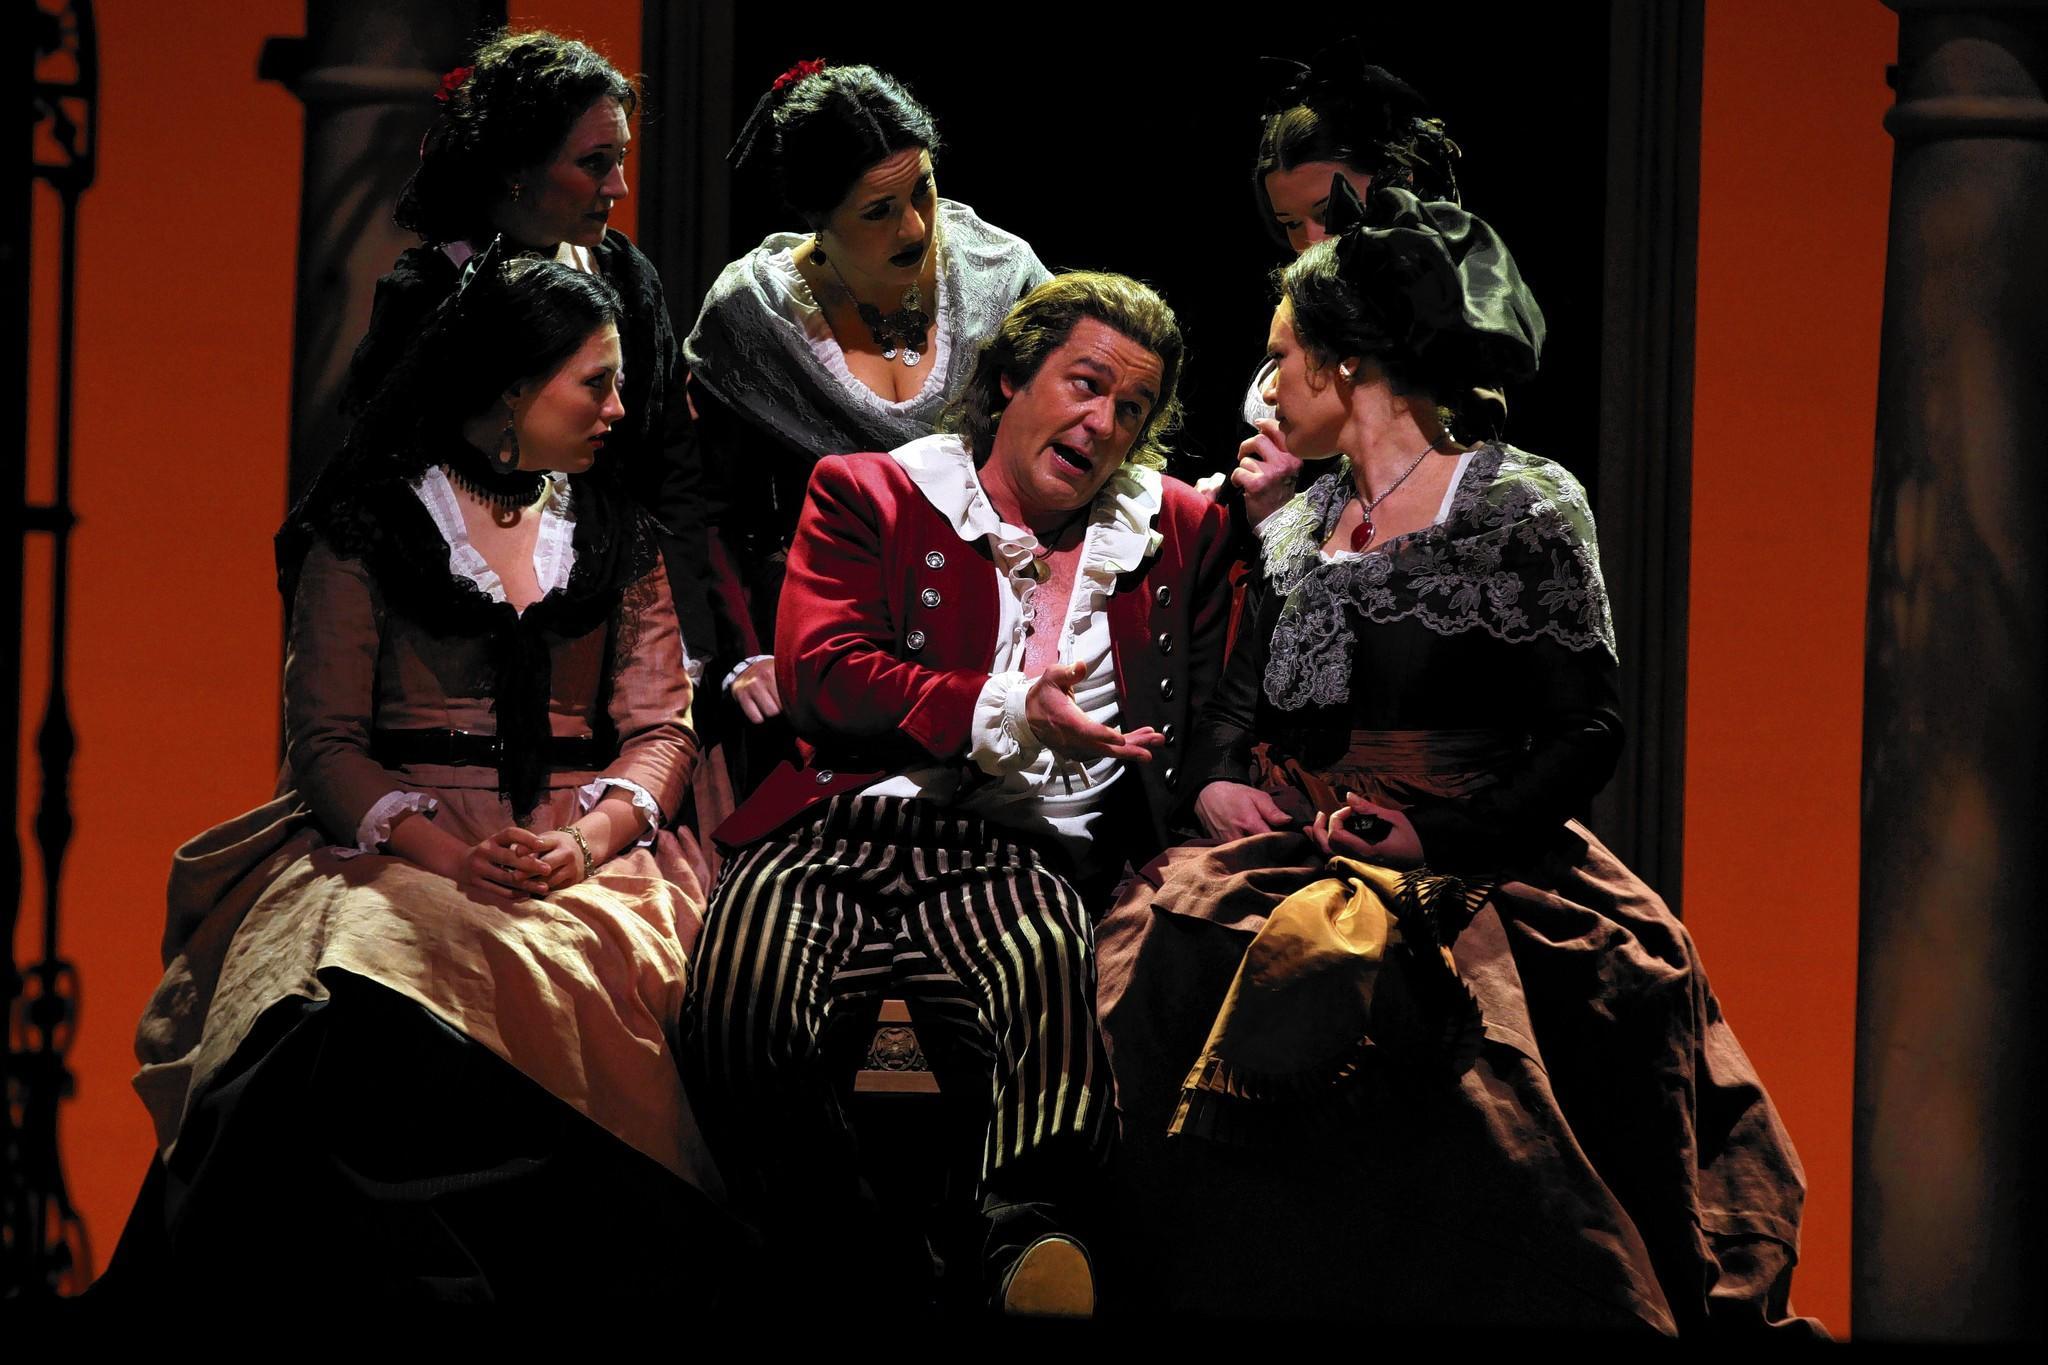 Barber Of Seville Summary : Review: Barber of Seville at the Lyric Opera - tribunedigital ...